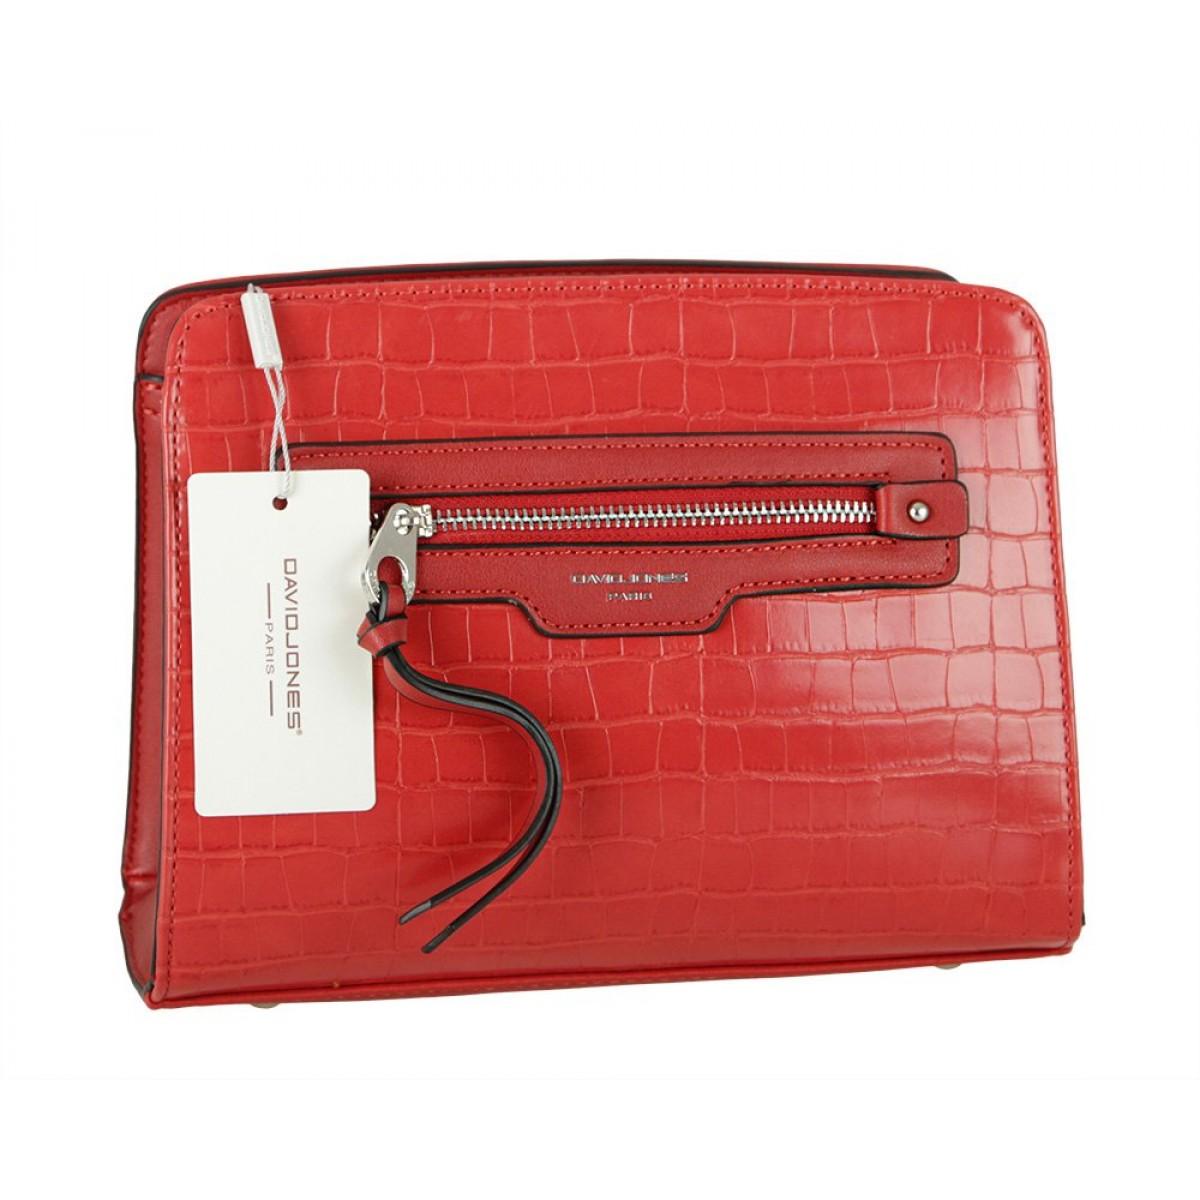 Жіноча сумка David Jones 6222-1 RED